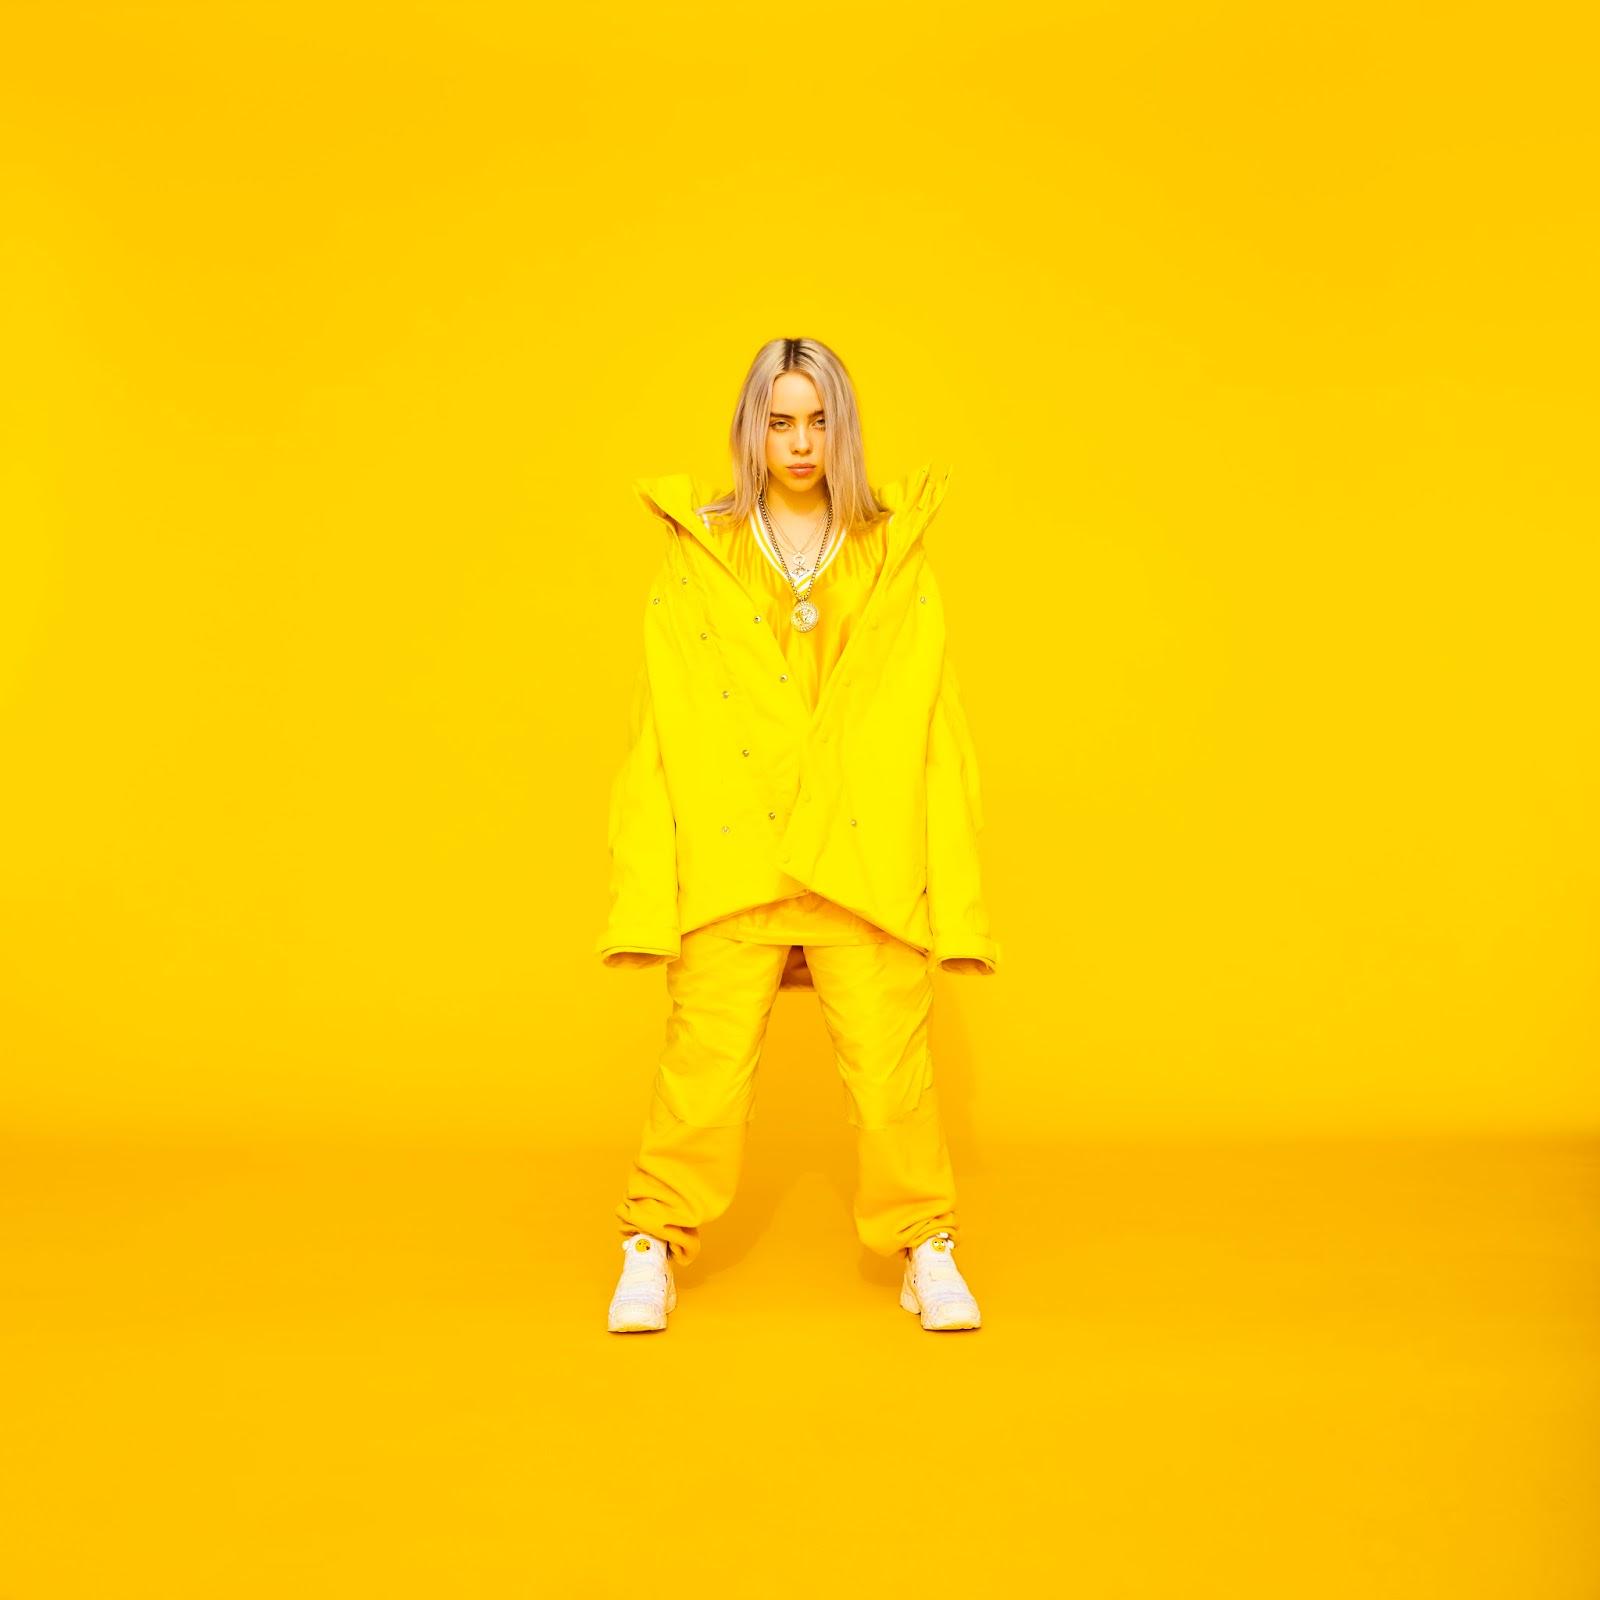 Billie Eilish Goes Gold Announces Sxsw Dates Faded4u